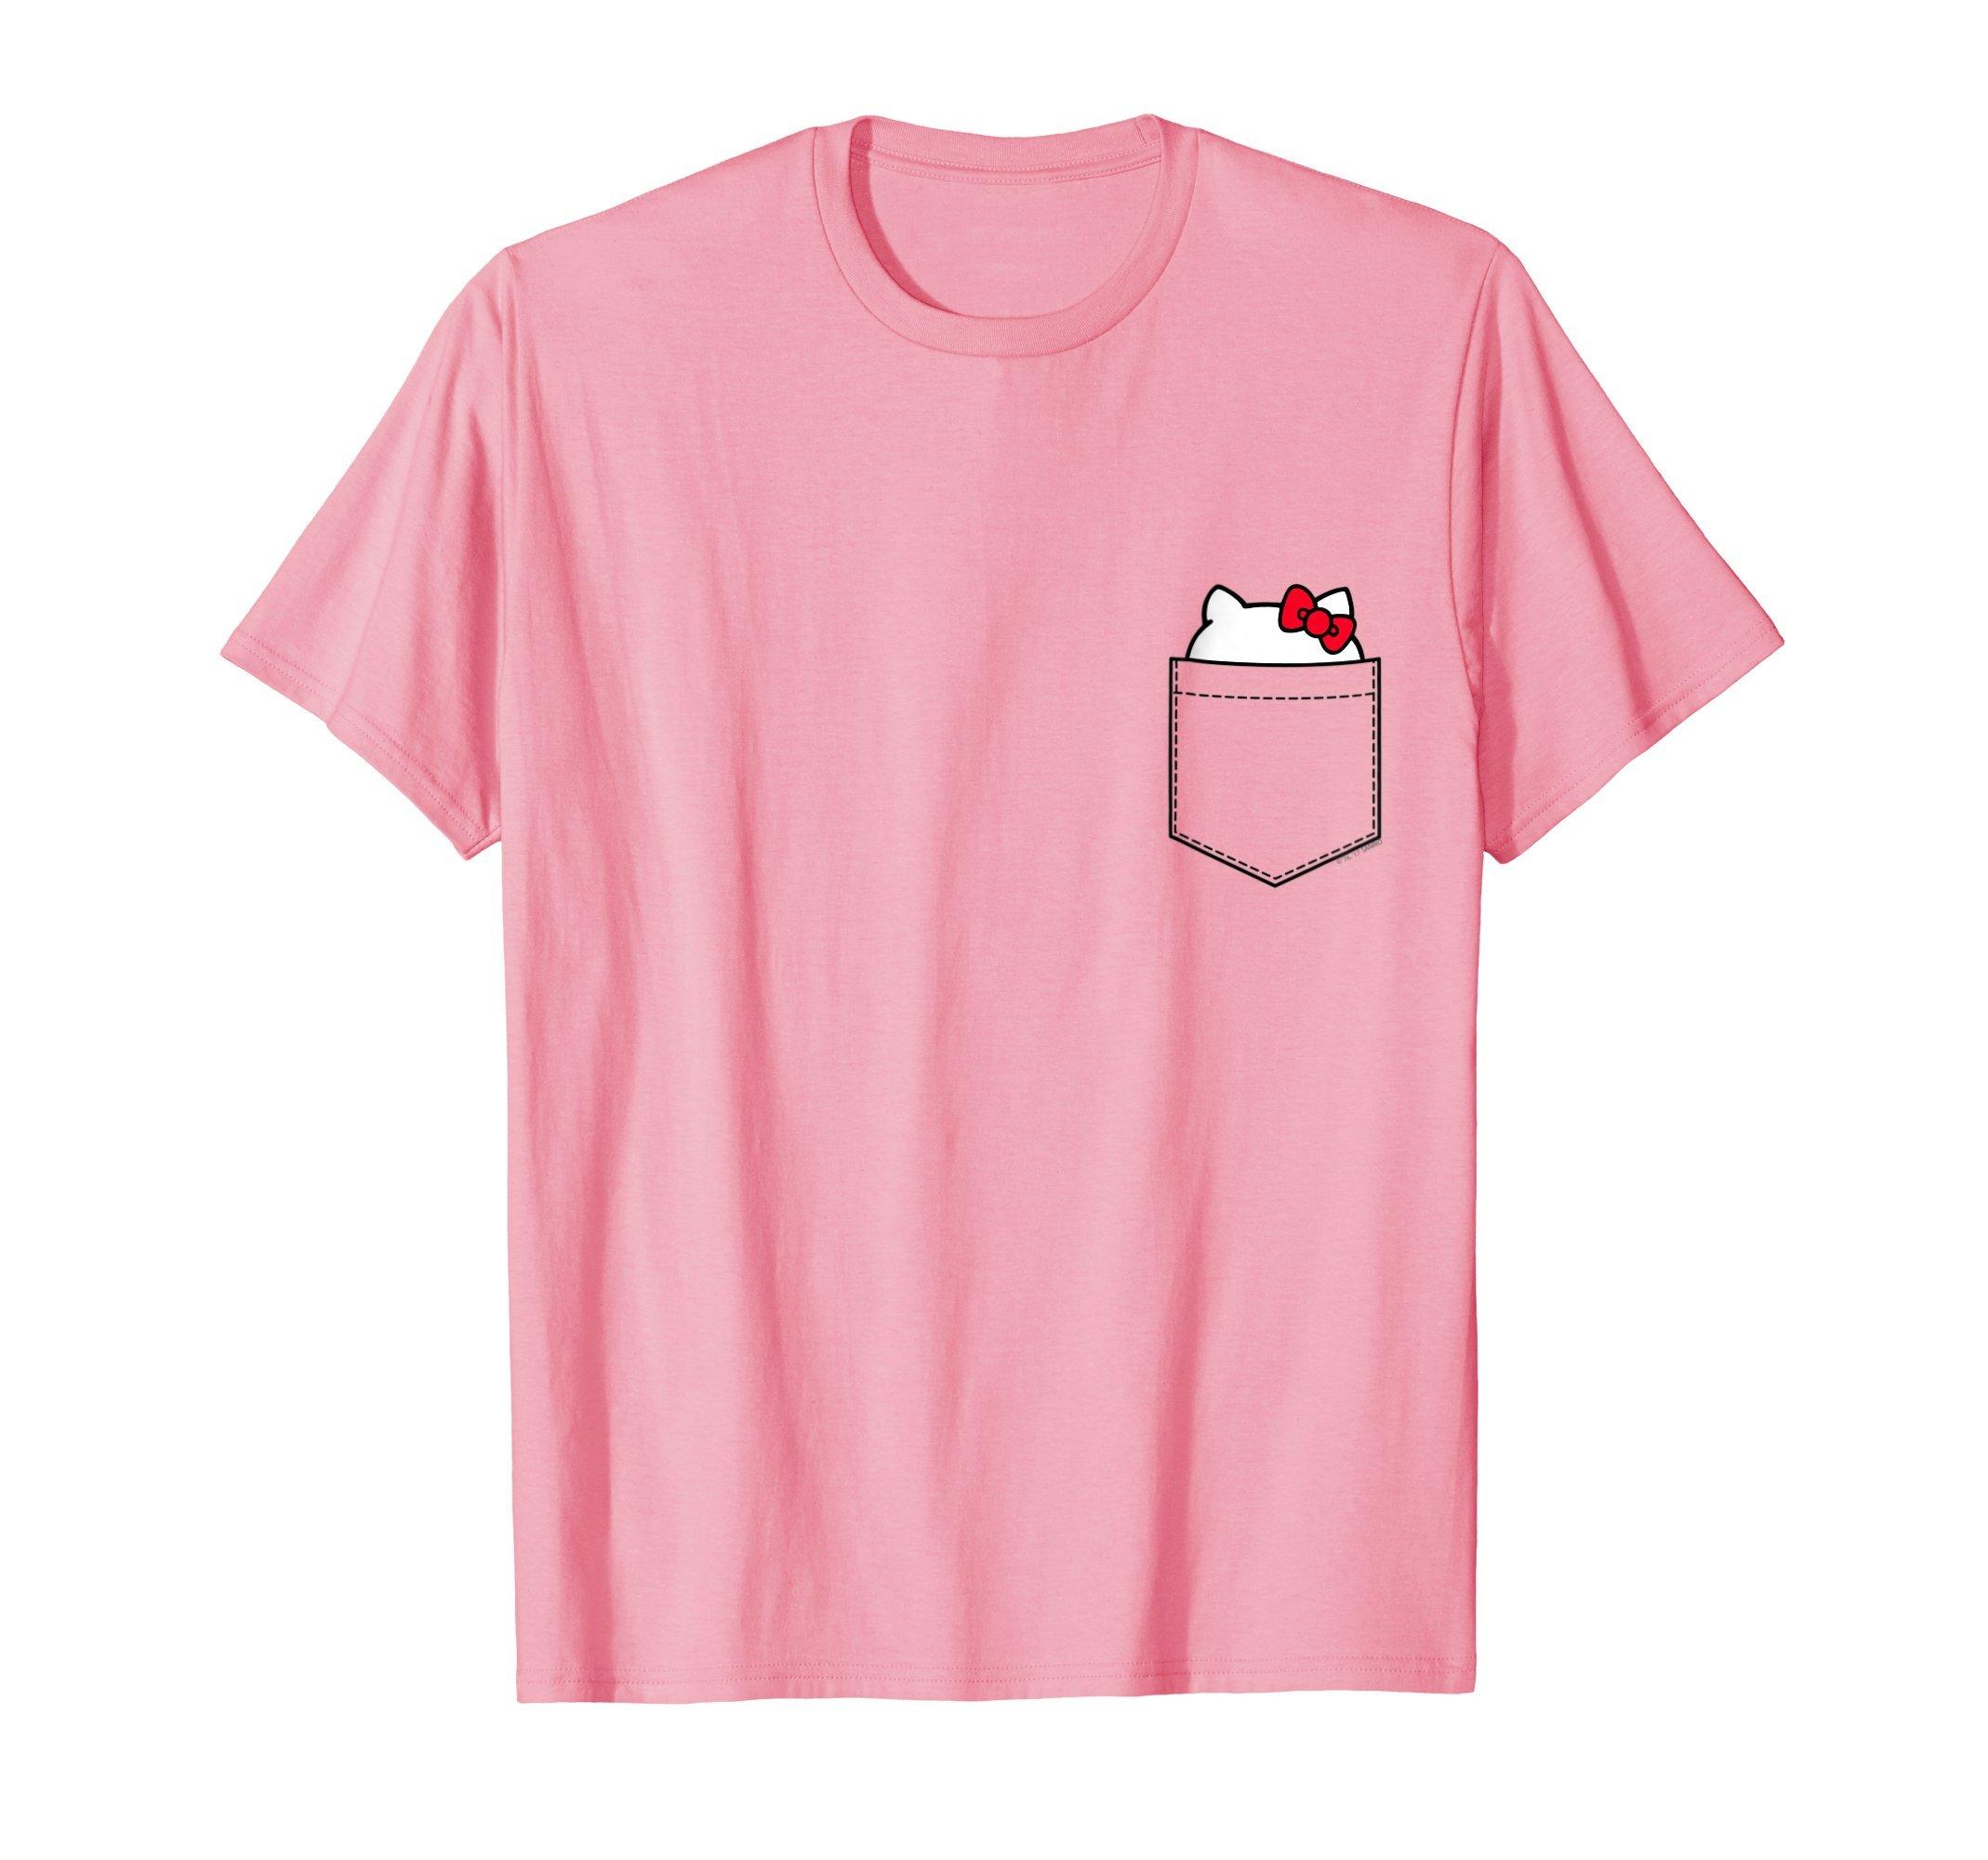 Mens Hello Kitty Peeking Pocket Tee Shirt 3XL Pink